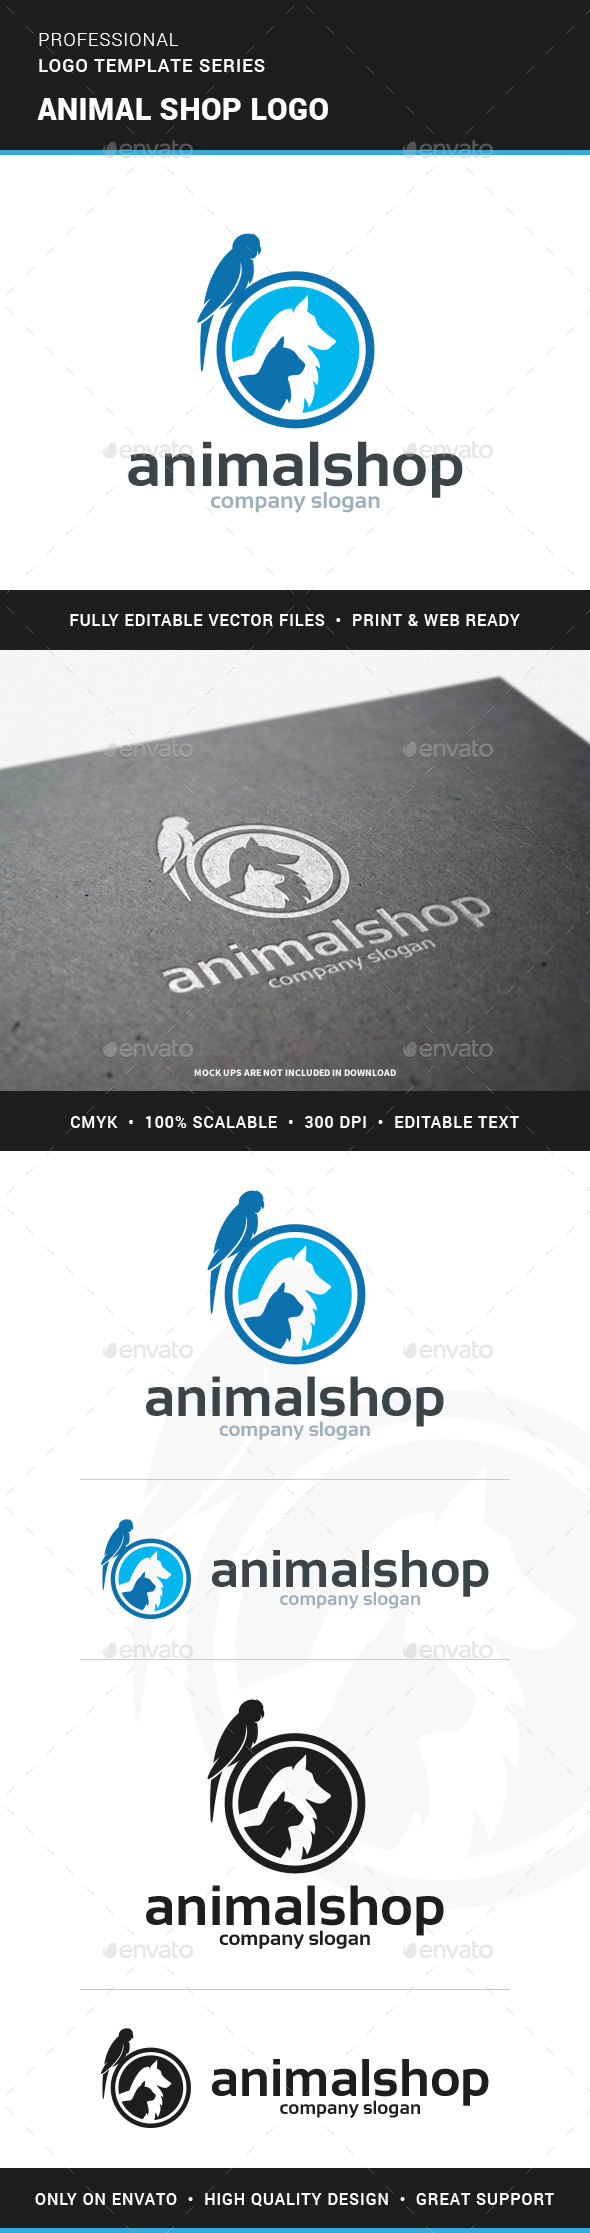 Animal Shop Logo Template